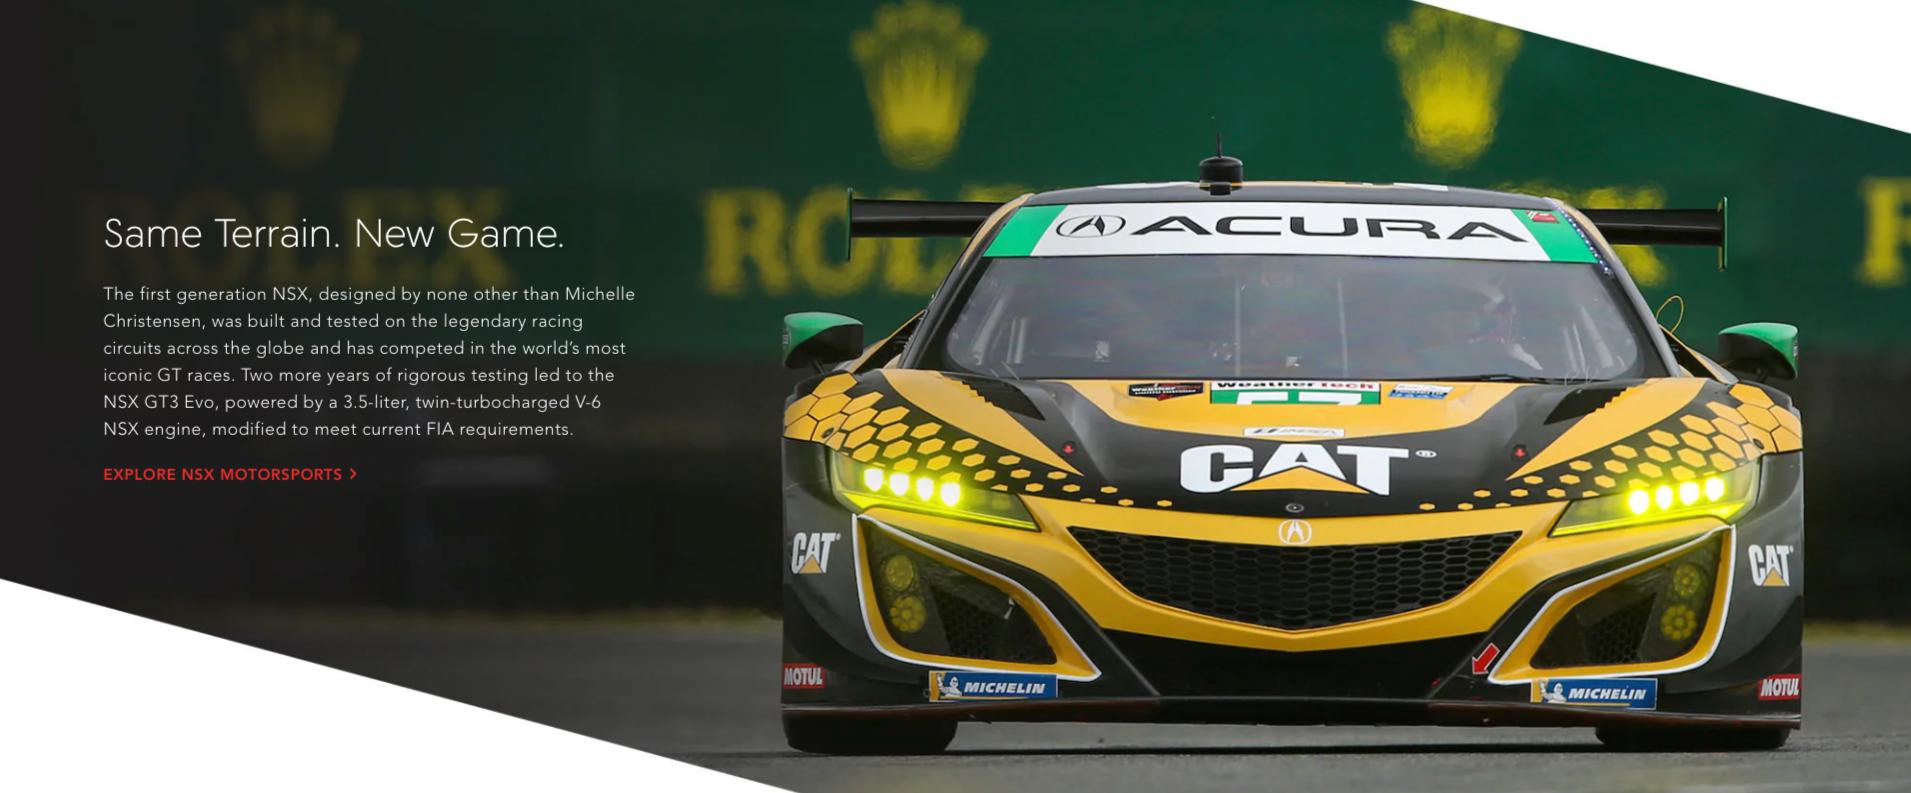 Acura Motorsport _ Female Race Car Drivers _ Acura com (3).png